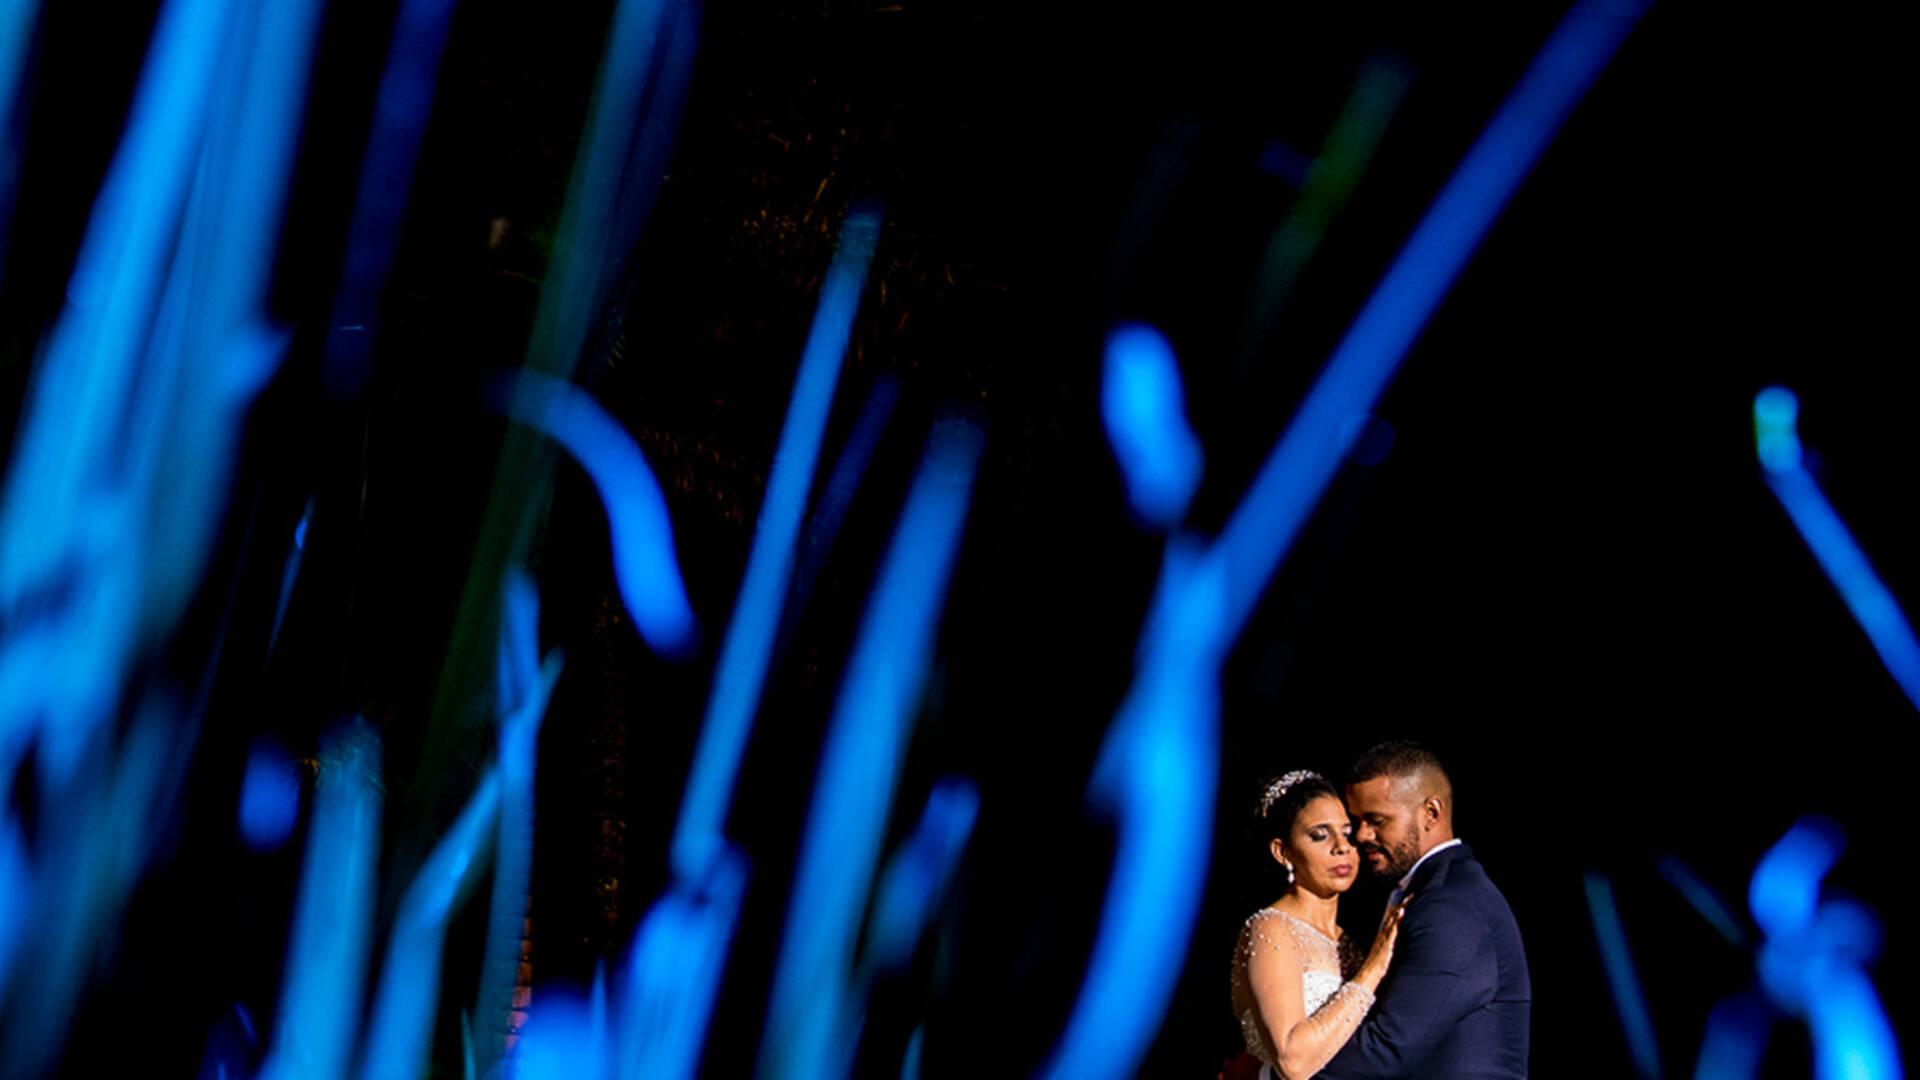 Casamento de Cris e Leo